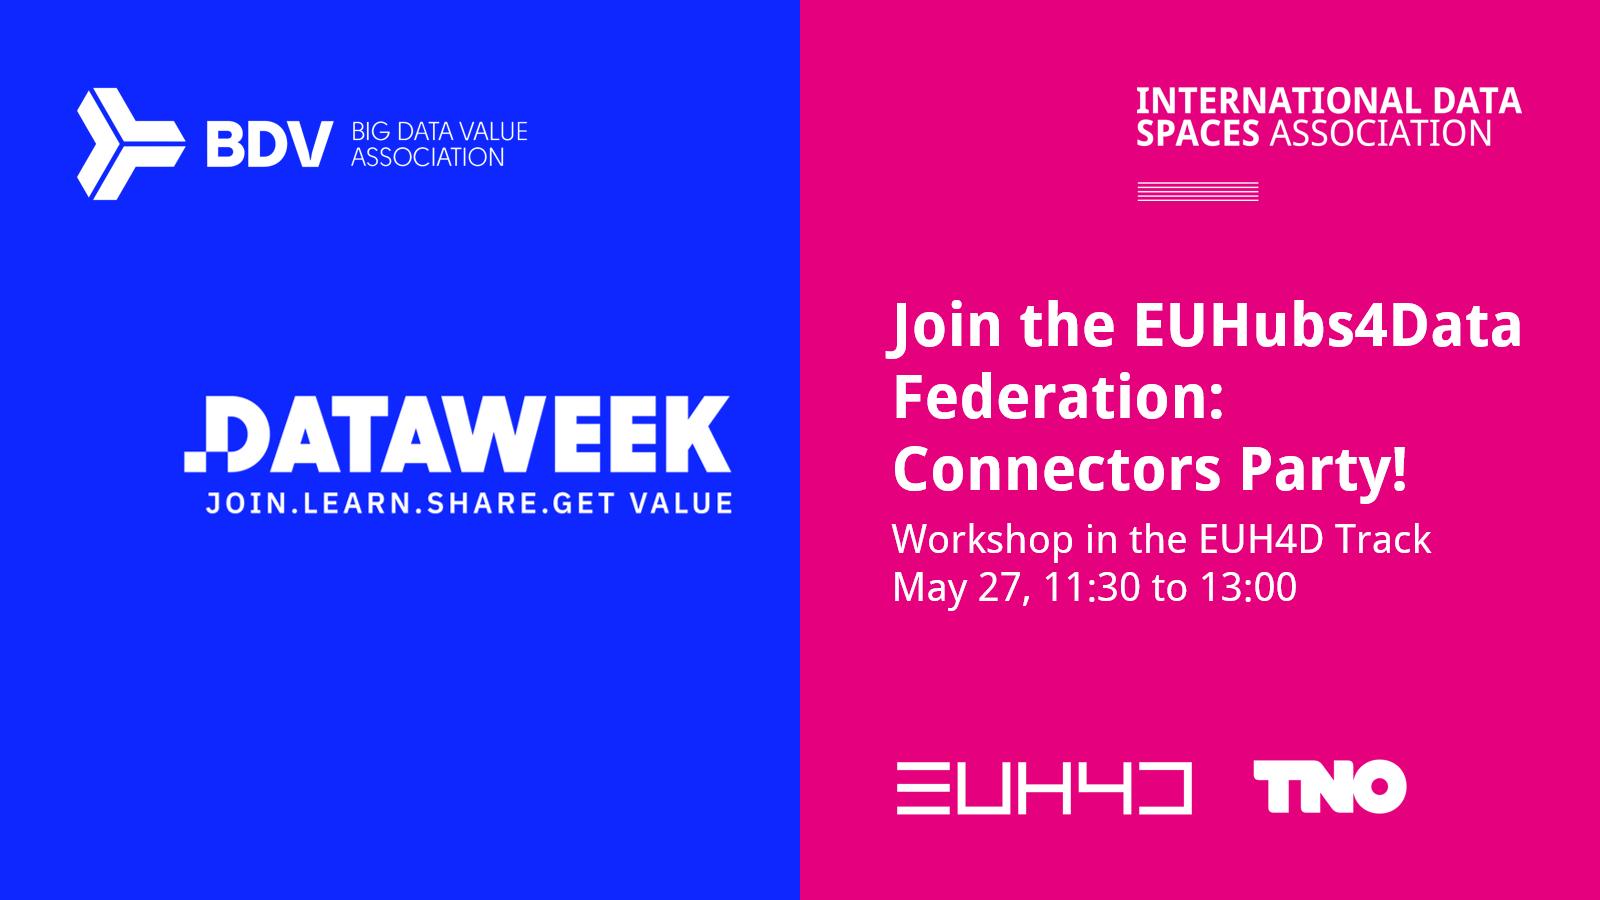 BDVA Data Week 2021 | Workshop: Connectors Party